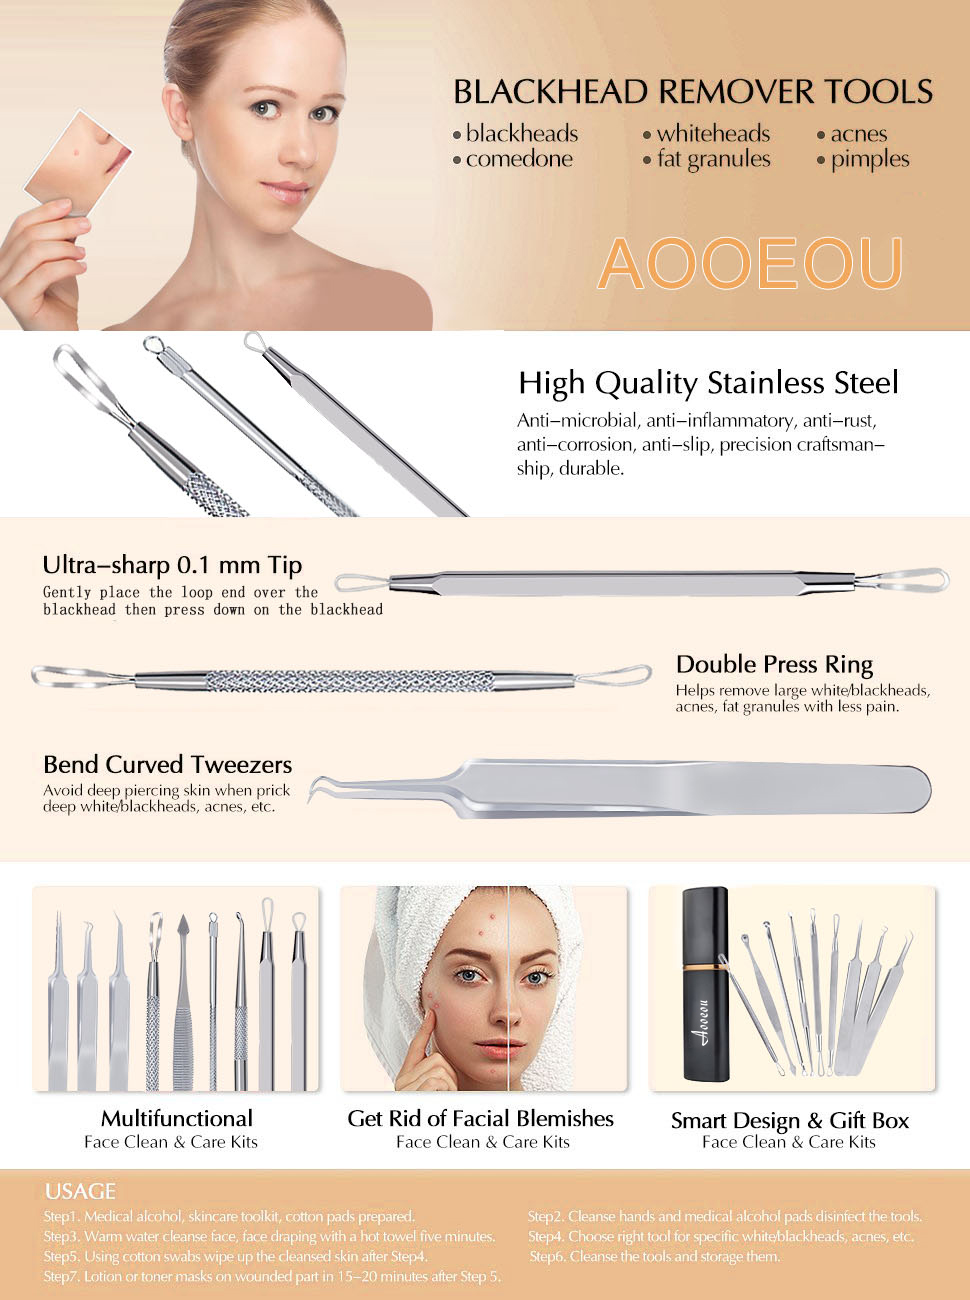 blackhead remover kit for Pimples,Blackheads,Zit Removing blackhead extractor pimple popper tool kit